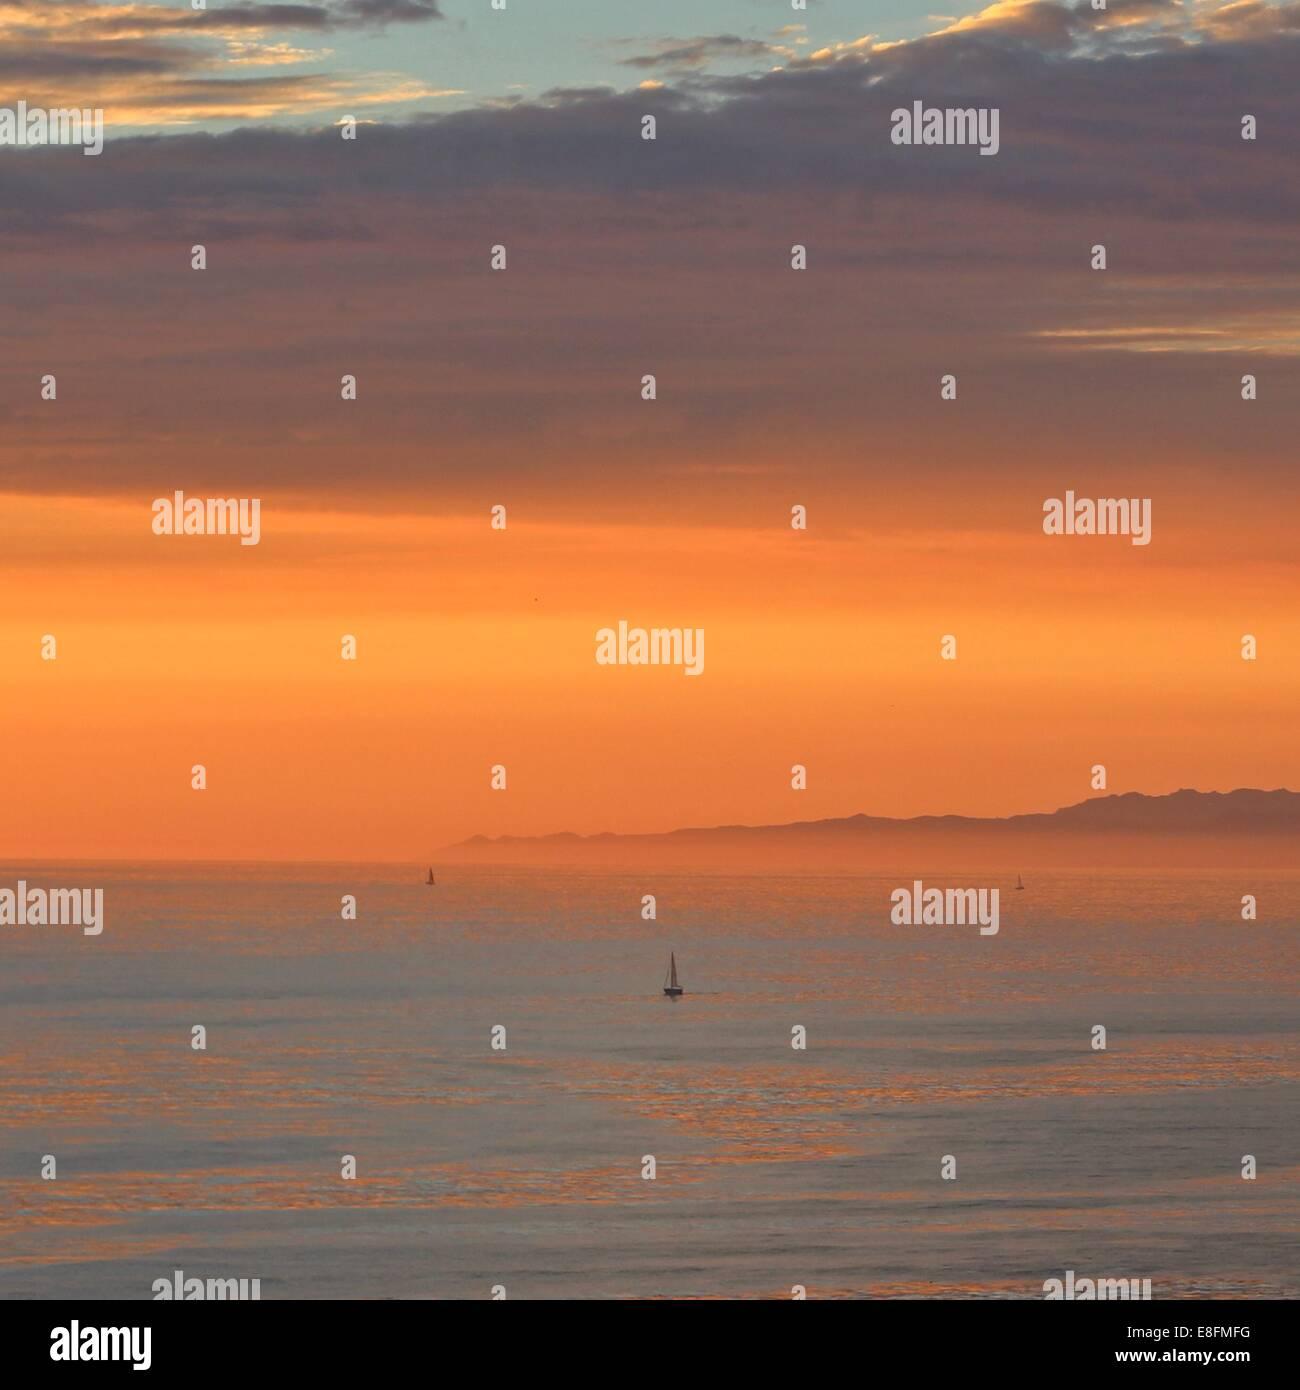 USA, California, Palos Verde, Sunset over ocean - Stock Image